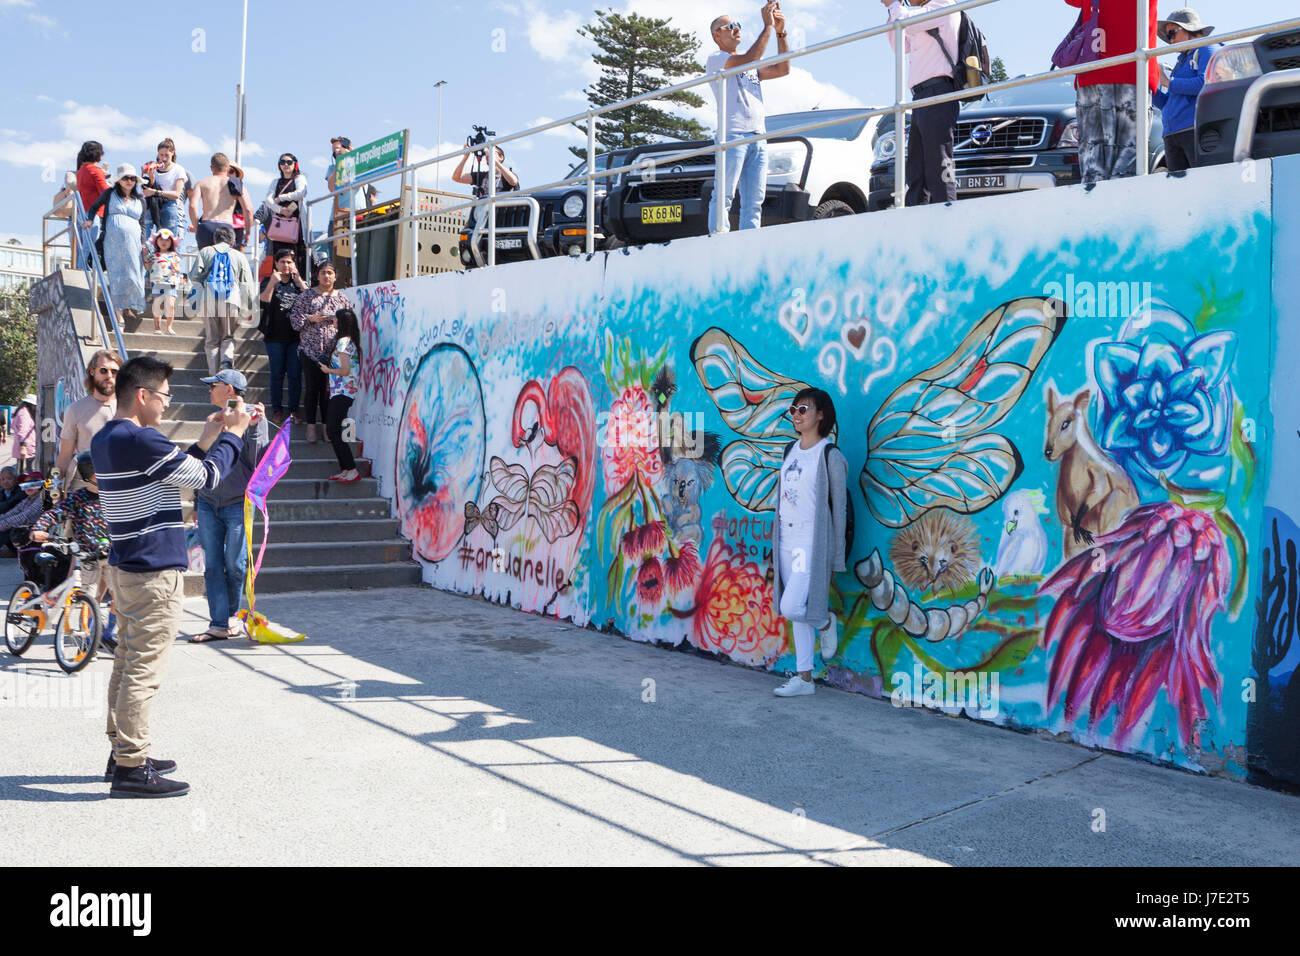 Graffiti walls stockfotos graffiti walls bilder alamy - Was tun gegen feuchte wande ...